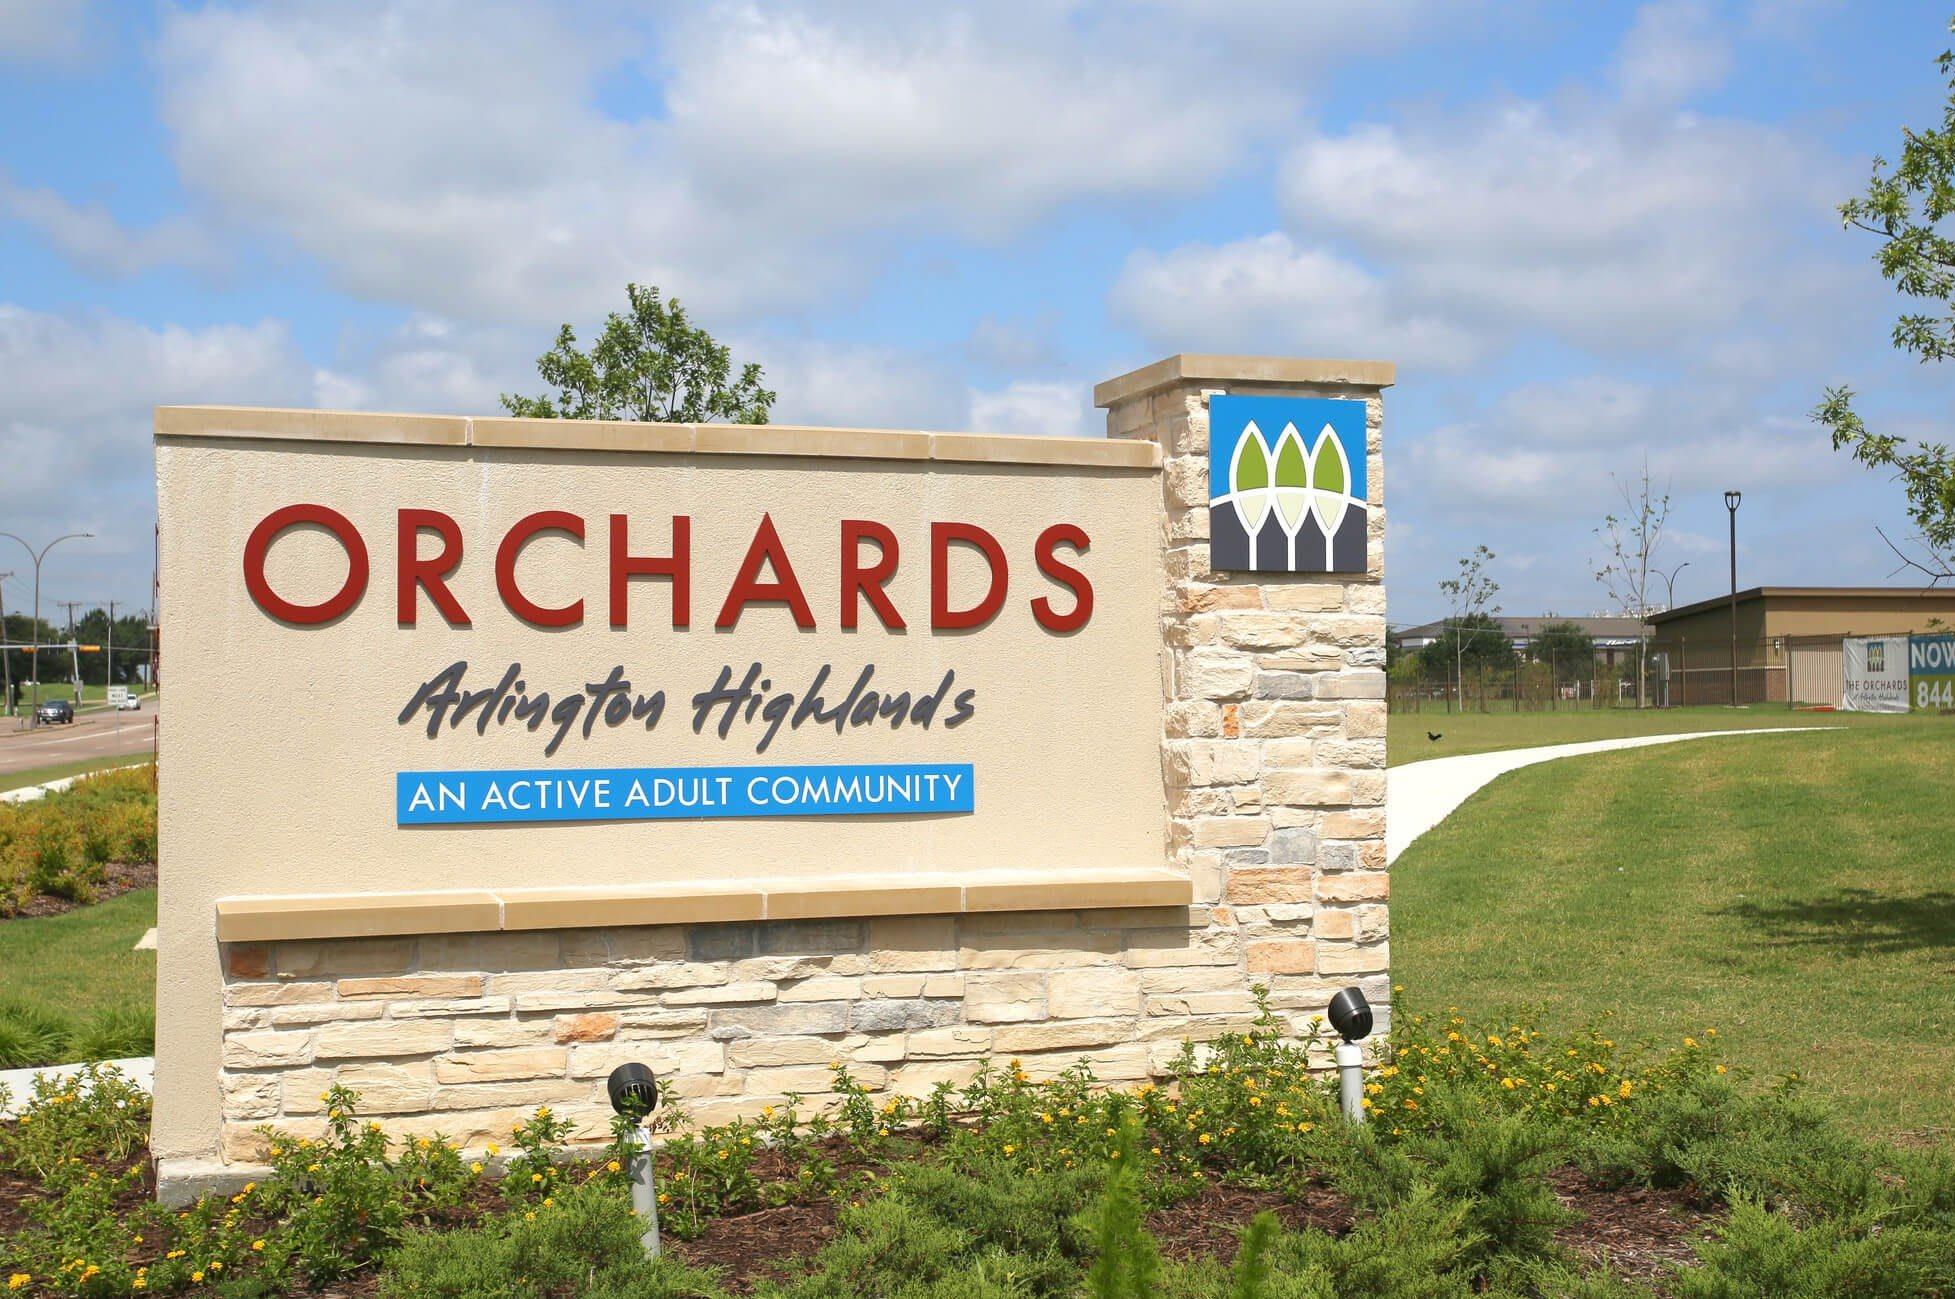 Photo 1 of The Orchard at Arlington Highlands